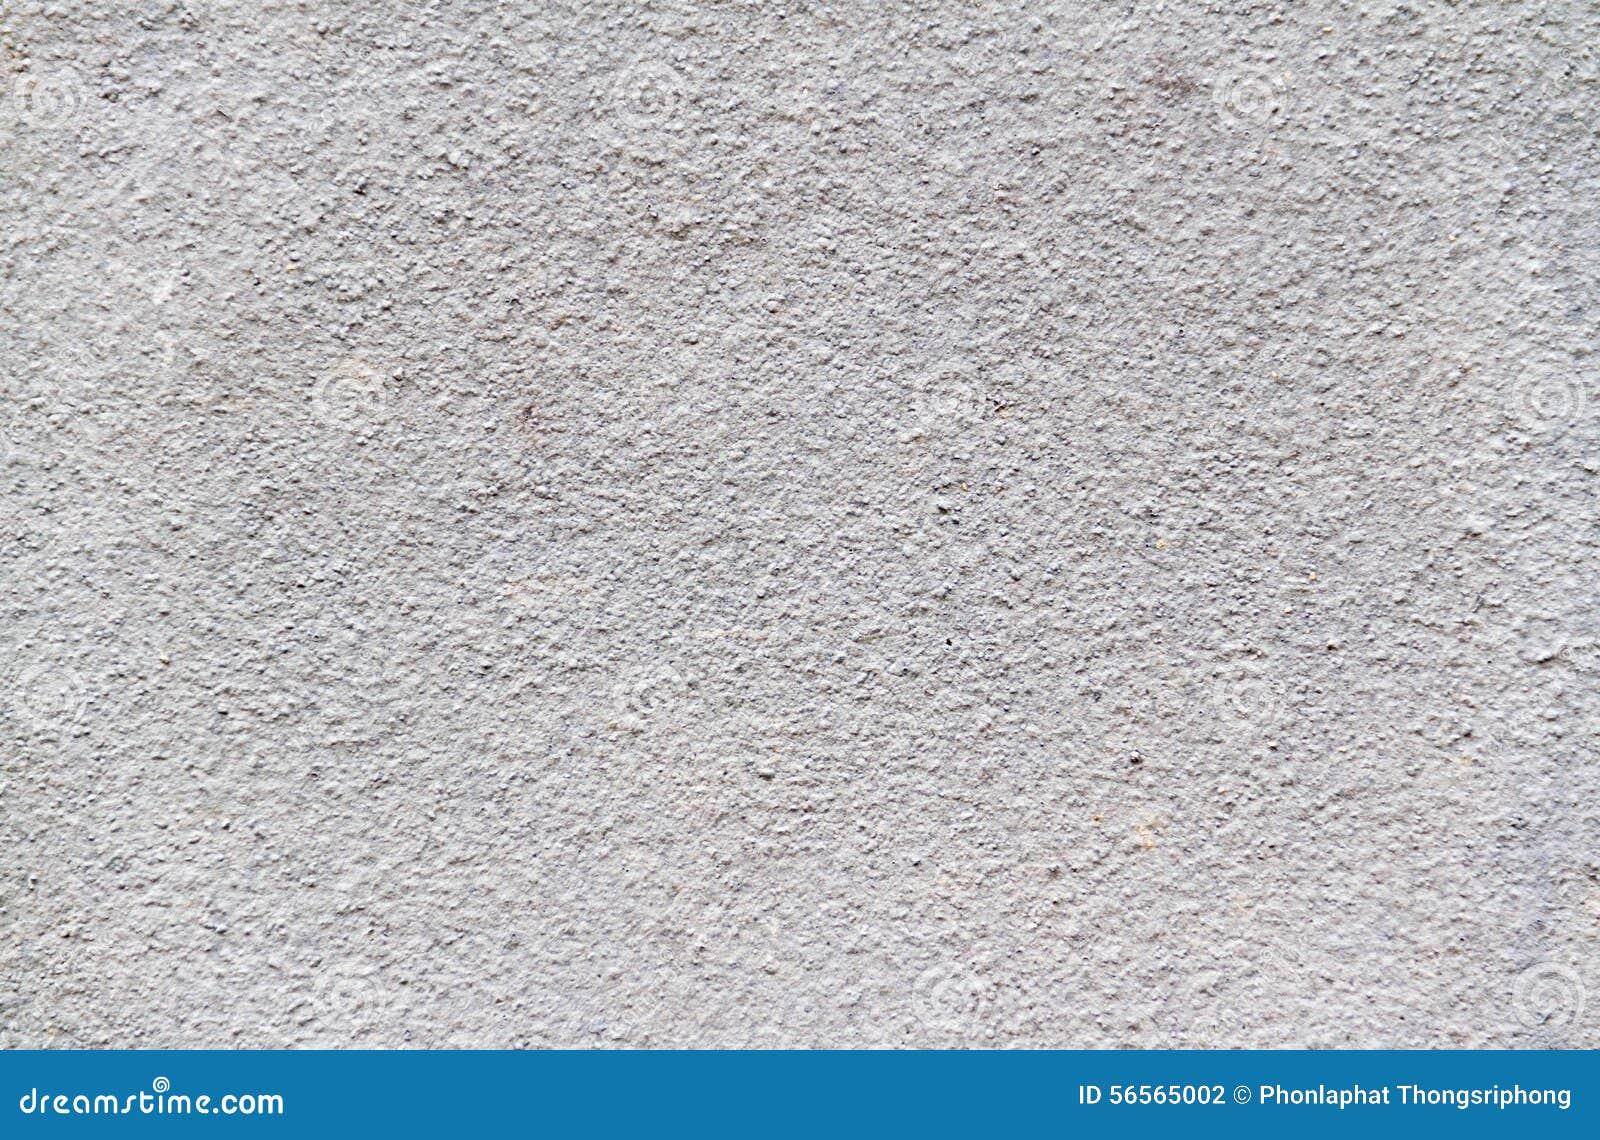 Download σύσταση πετρών βράχου βρύου Στοκ Εικόνες - εικόνα από μάρμαρο, μακροεντολή: 56565002